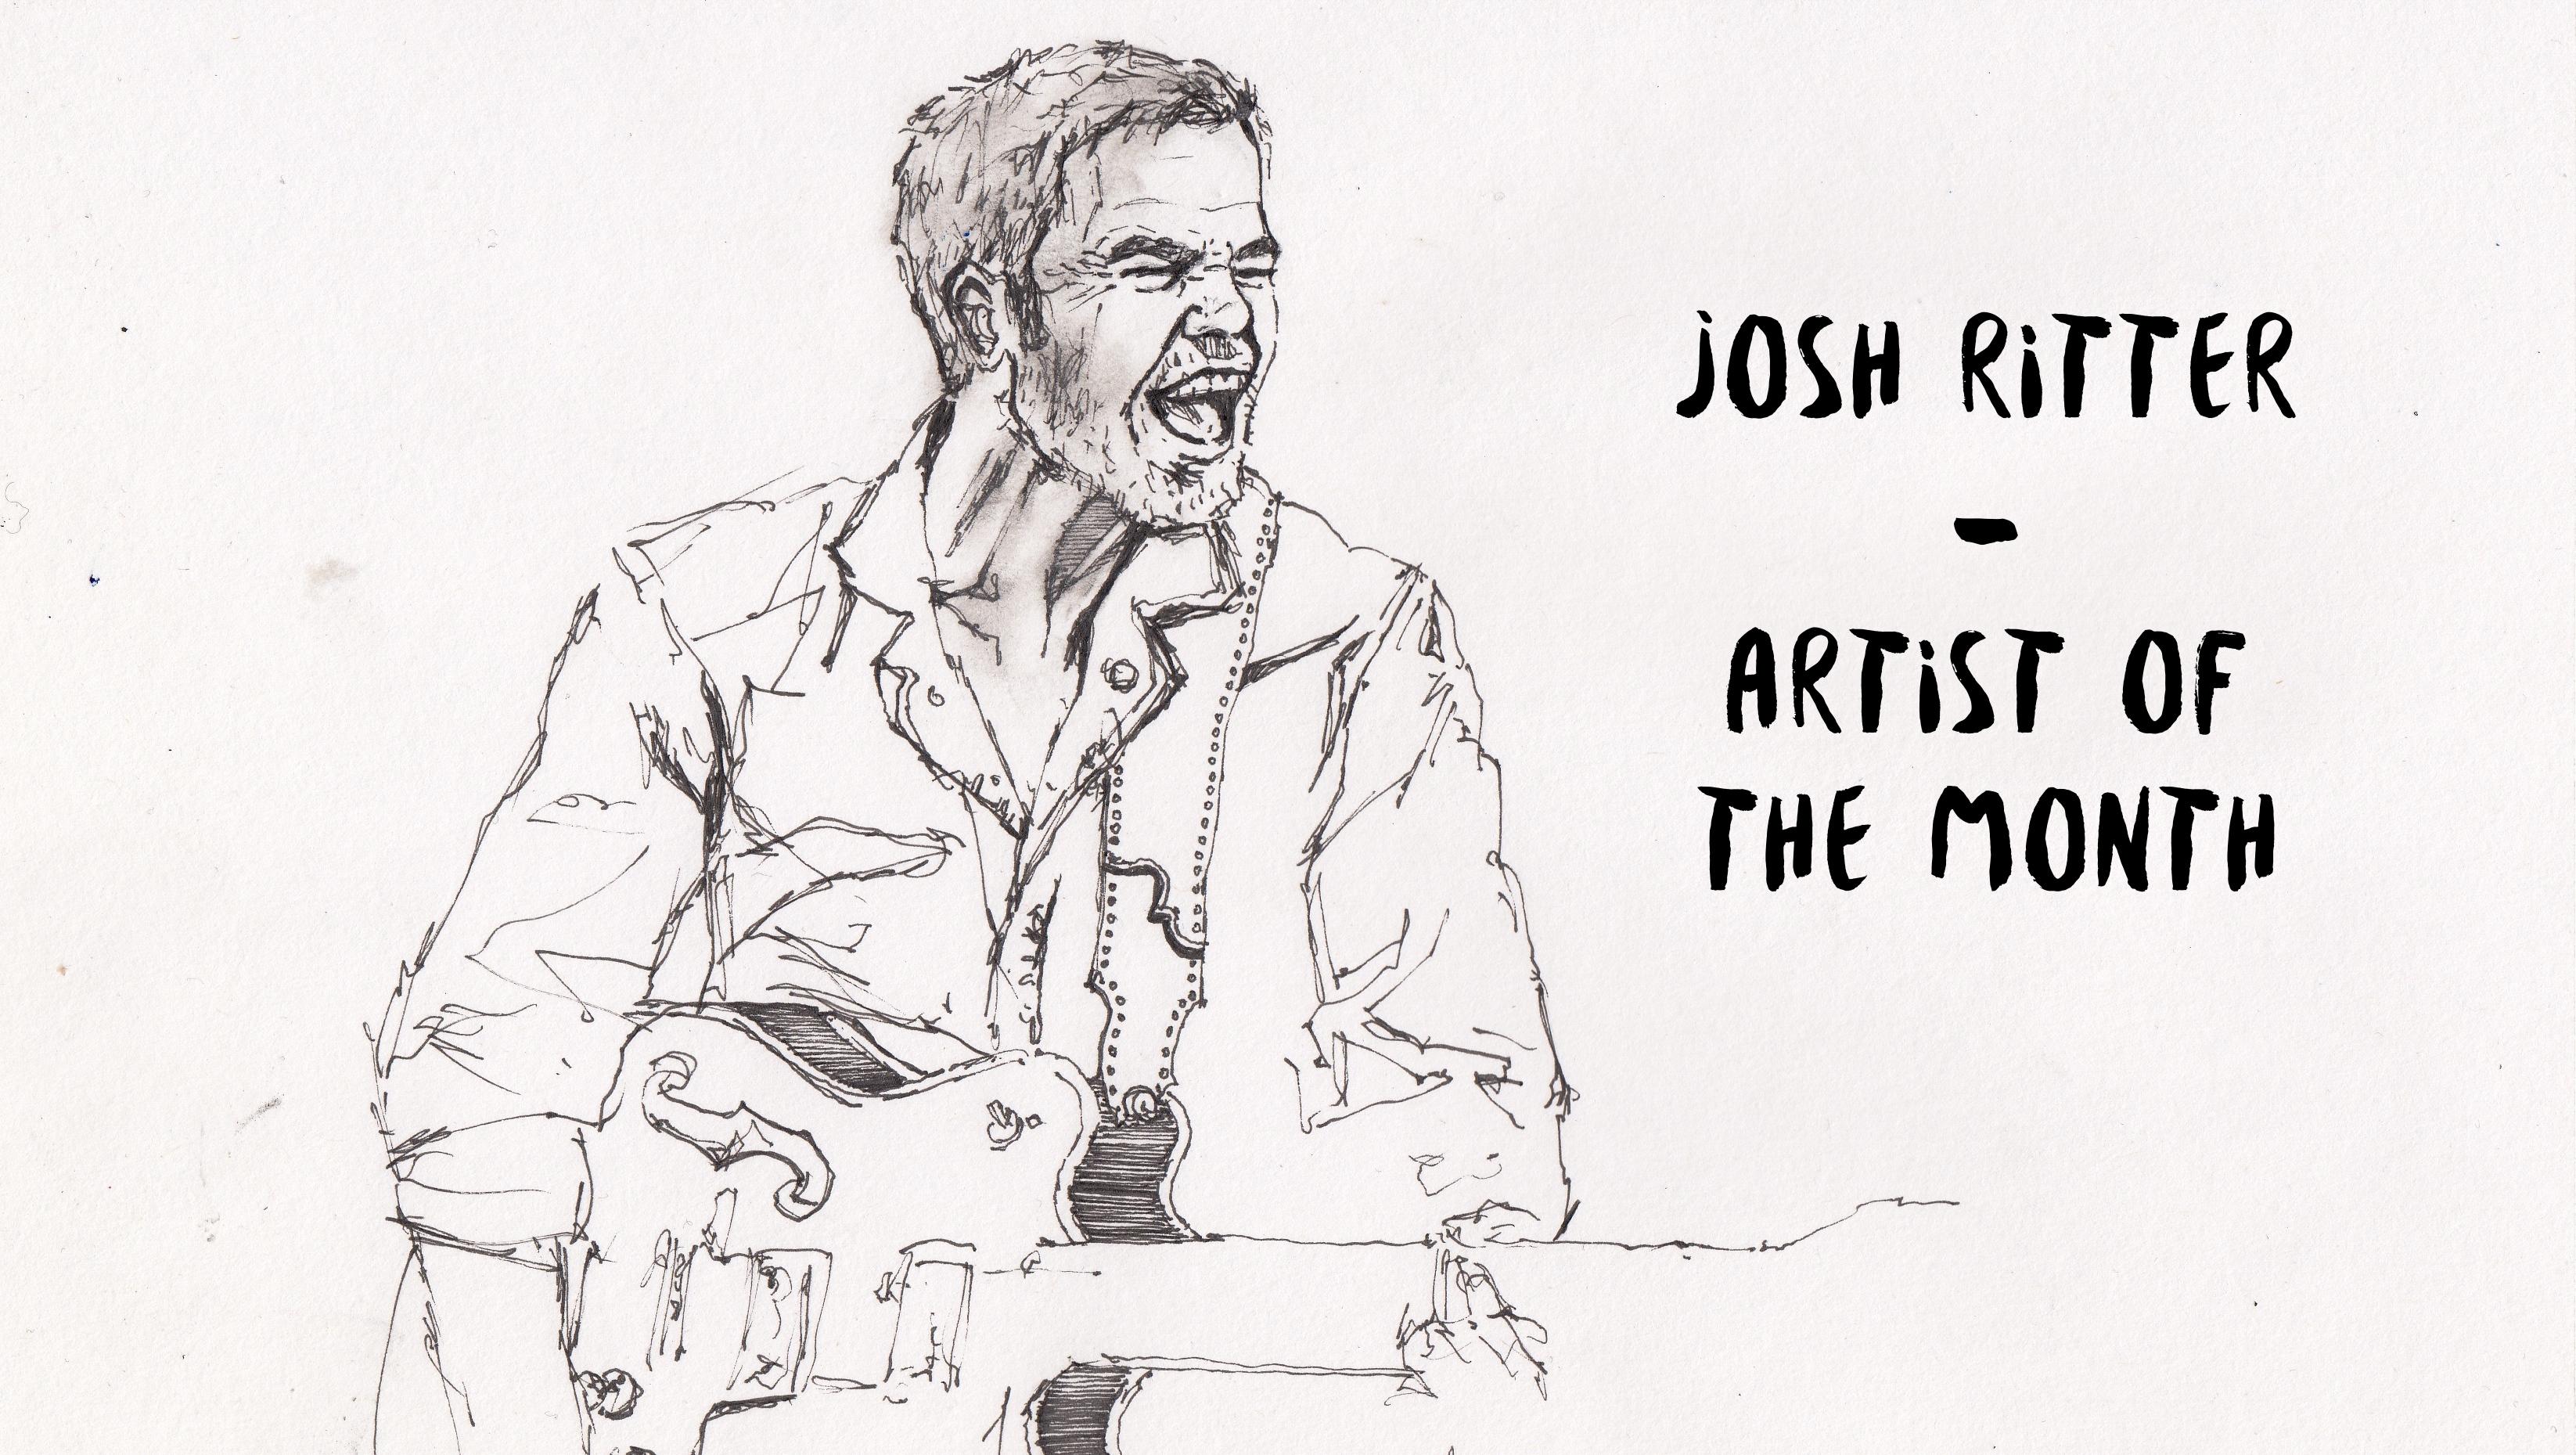 Artist of the Month: Josh Ritter